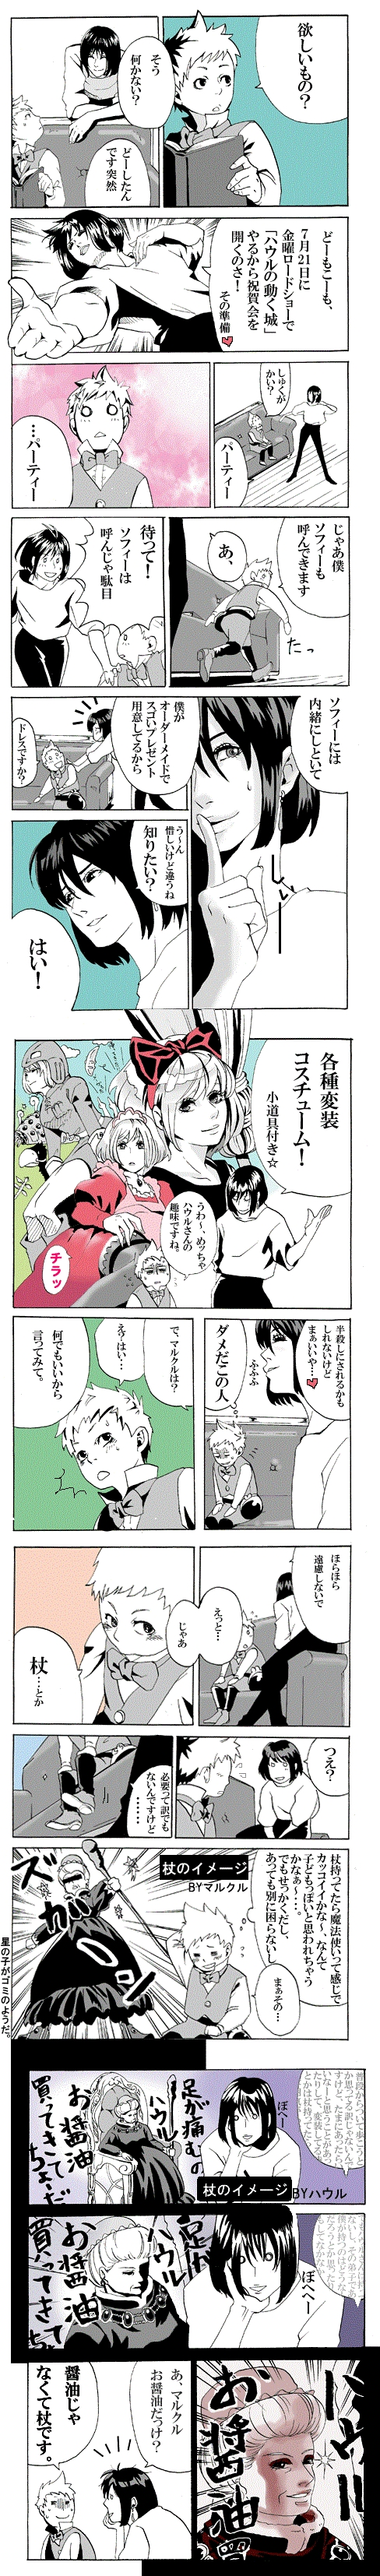 Tags: Anime, Majo no Takkyuubin, Howl no Ugoku Shiro, Sophie Hatter, Markl, Howl, Stunned, Nausicaa (Cosplay), Lettie Hatter, Kiki (Majo no Takkyuubin) (Cosplay), Confused, Advice, Translation Request, Howl's Moving Castle